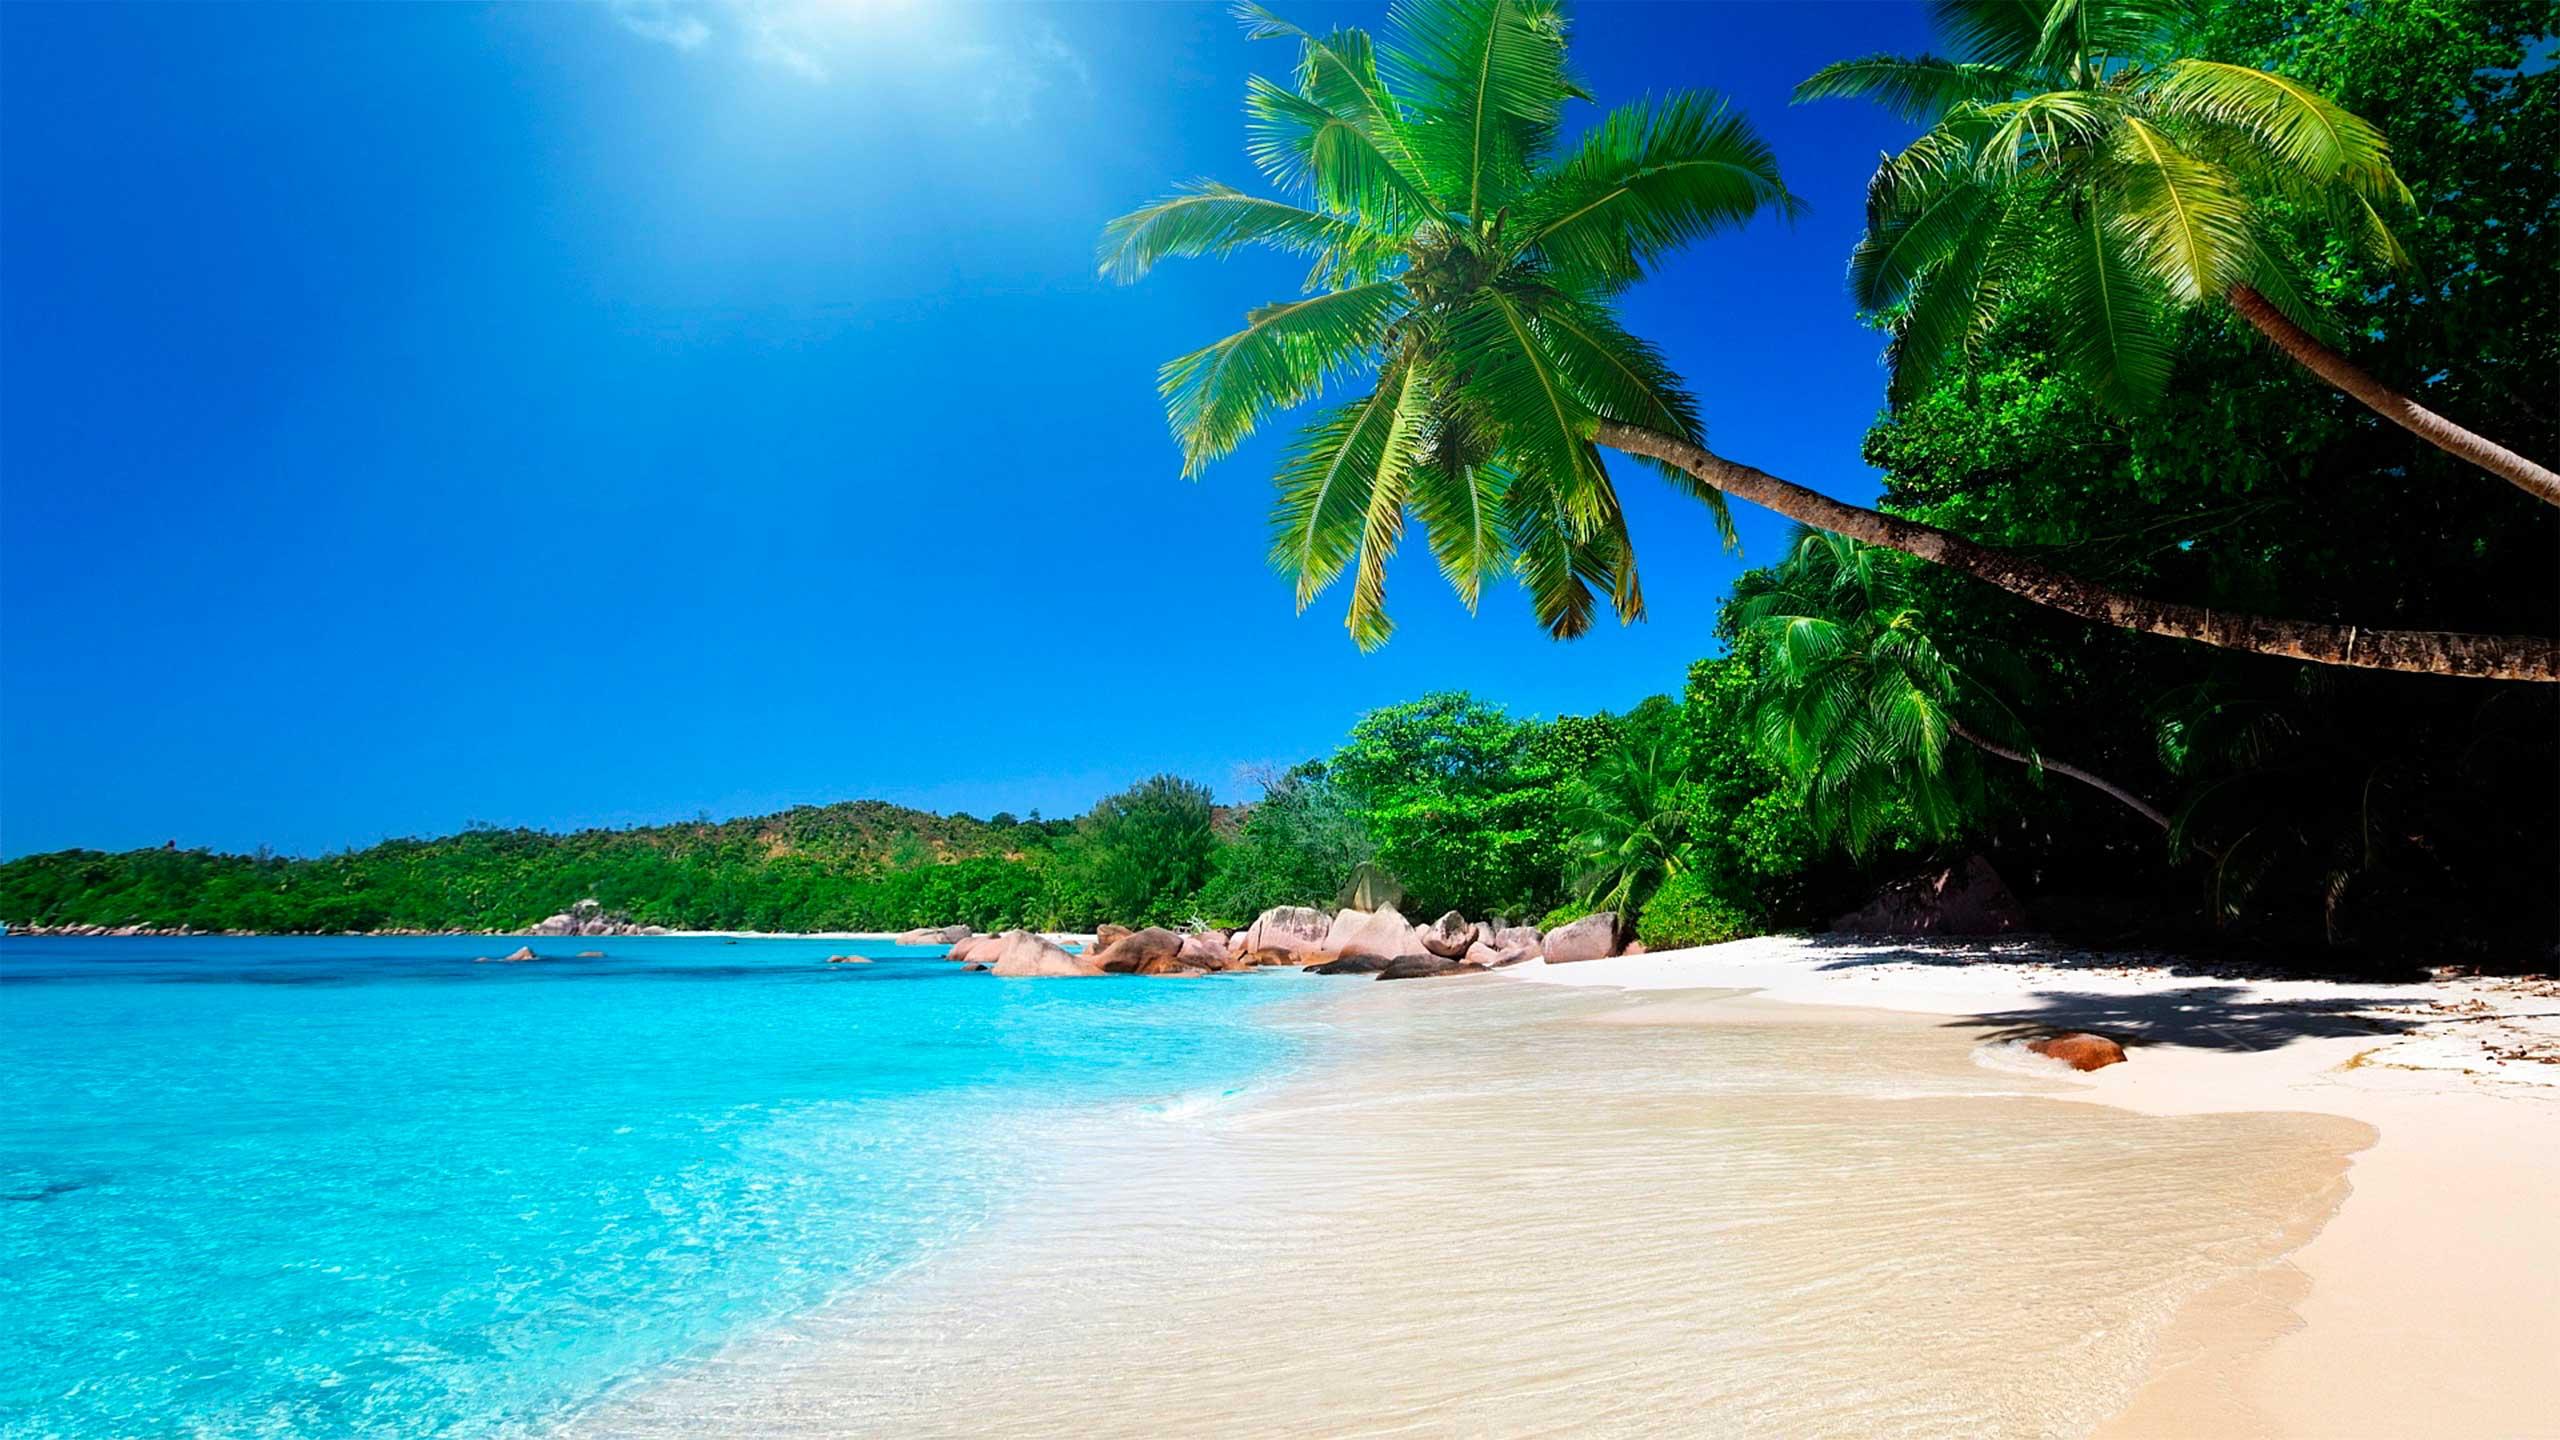 playa-costa-rica